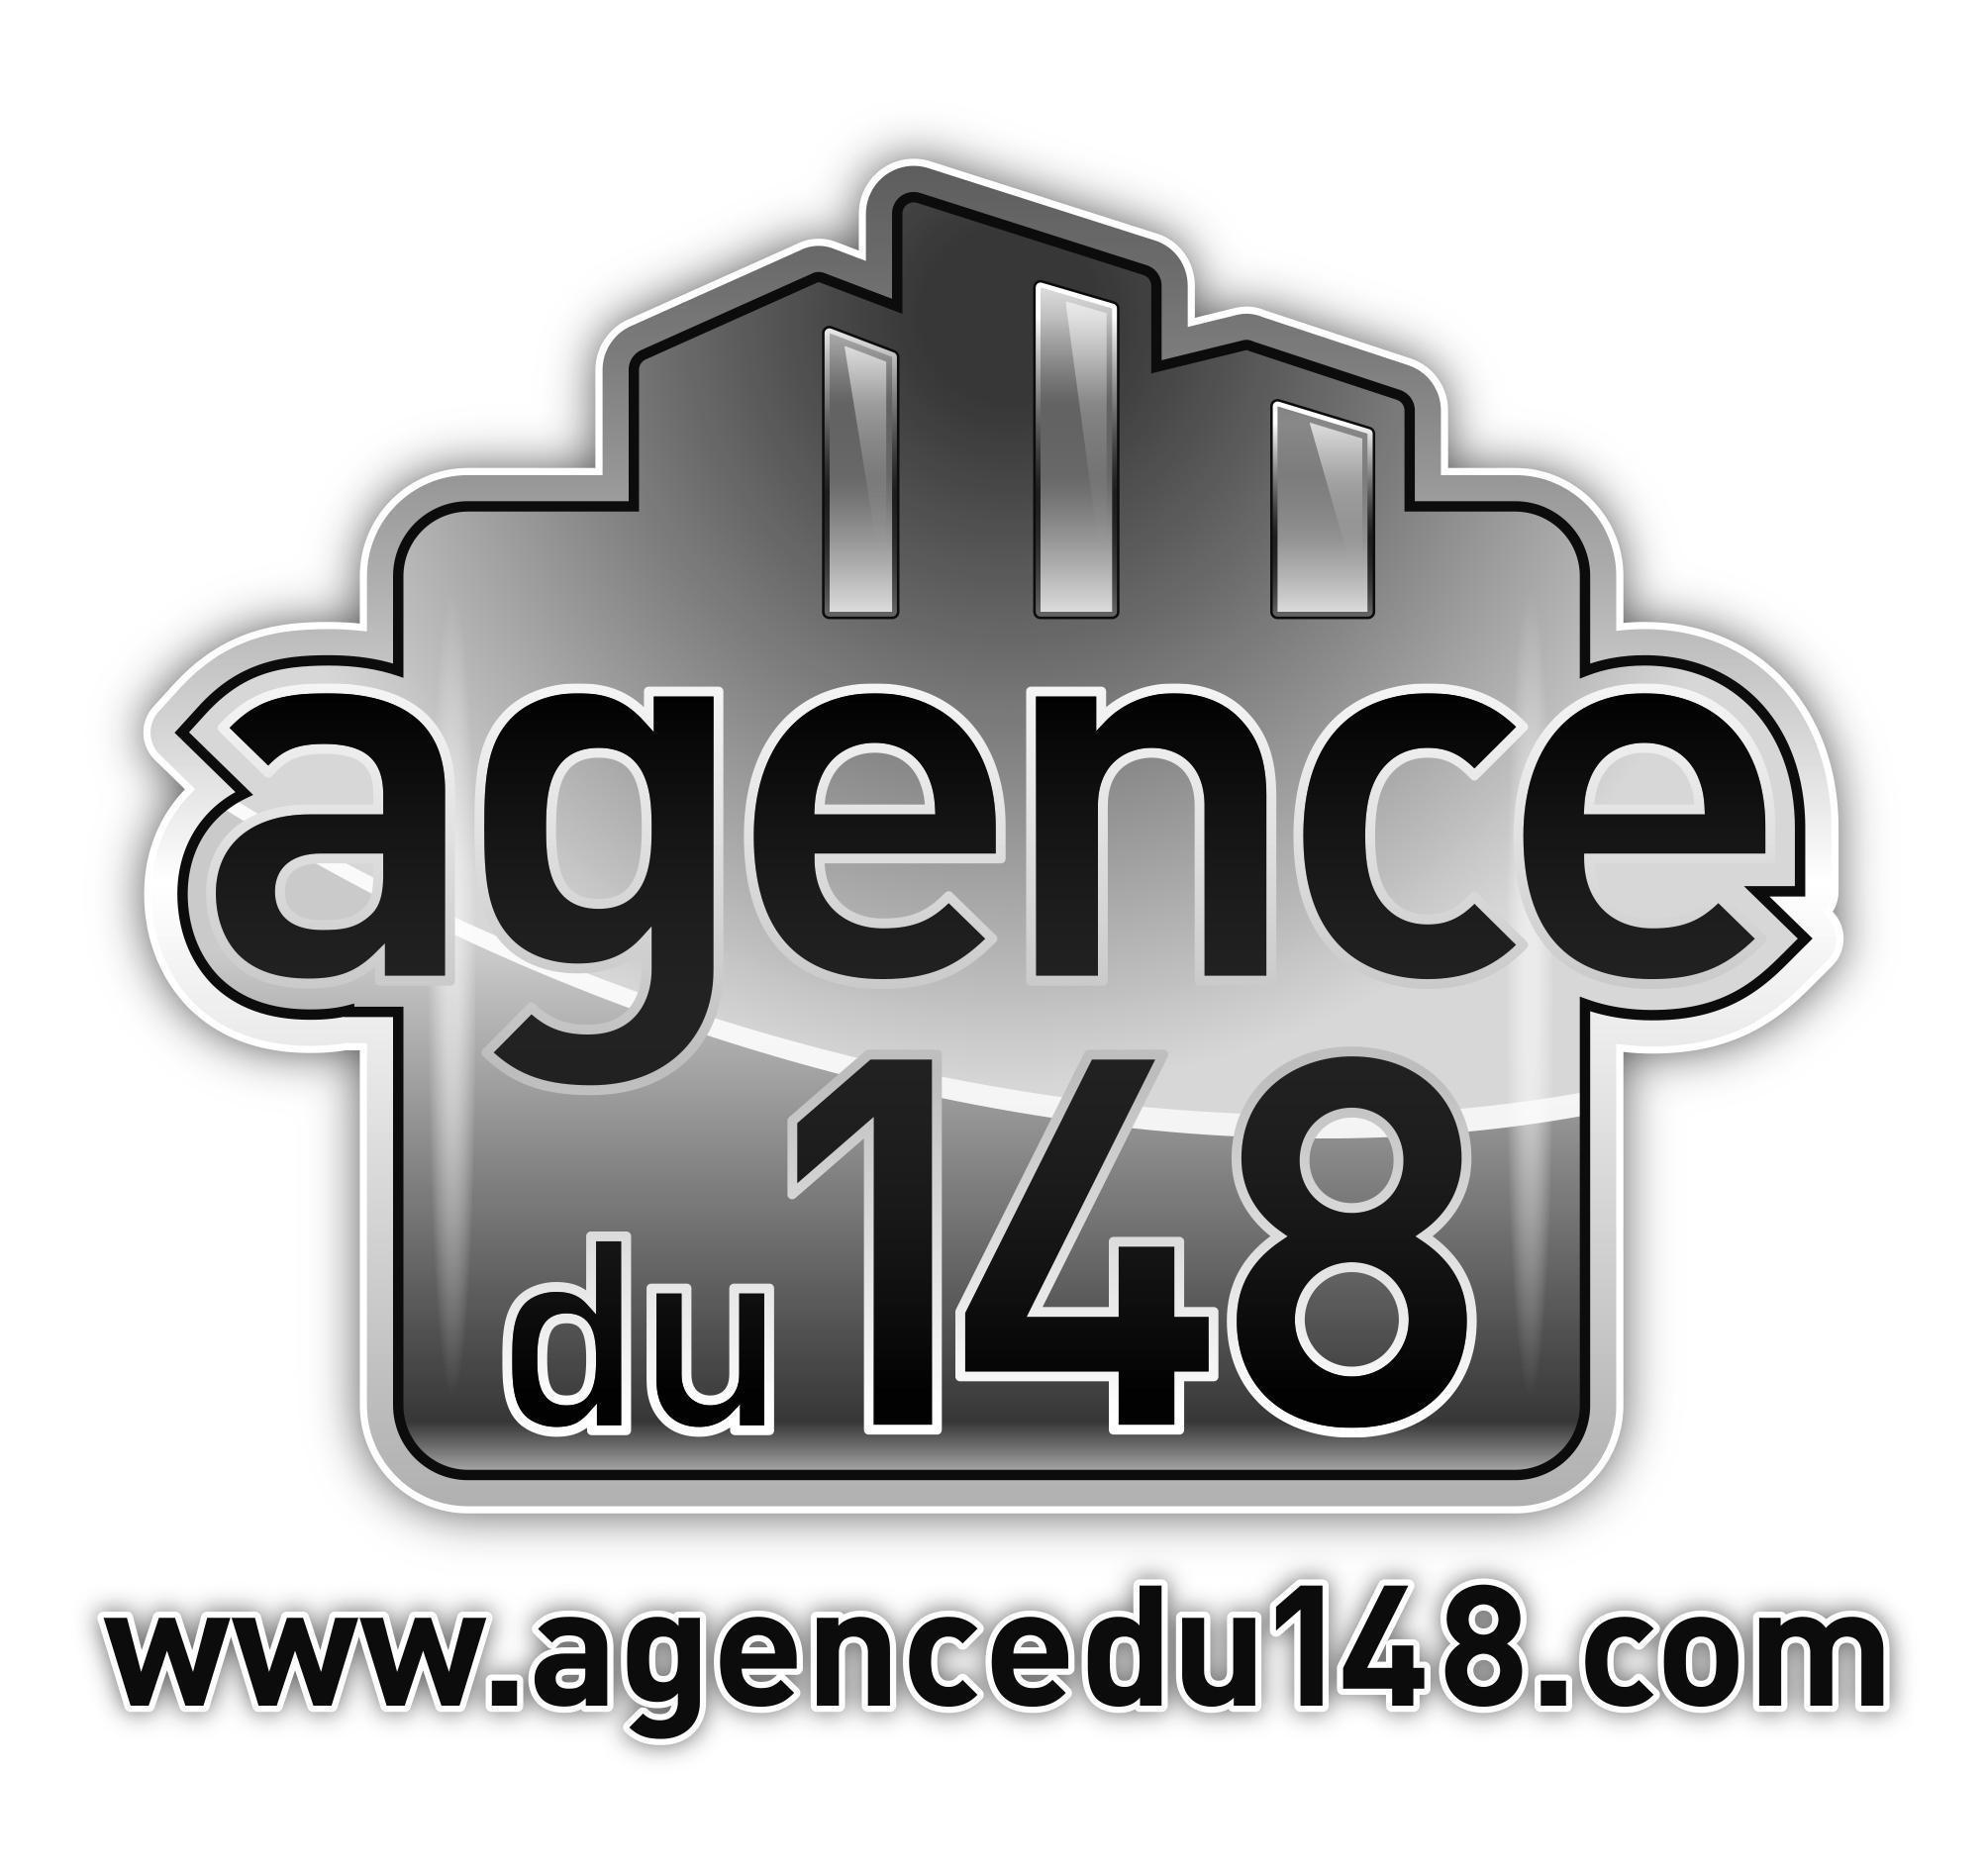 Image de l'agence Agence du 148